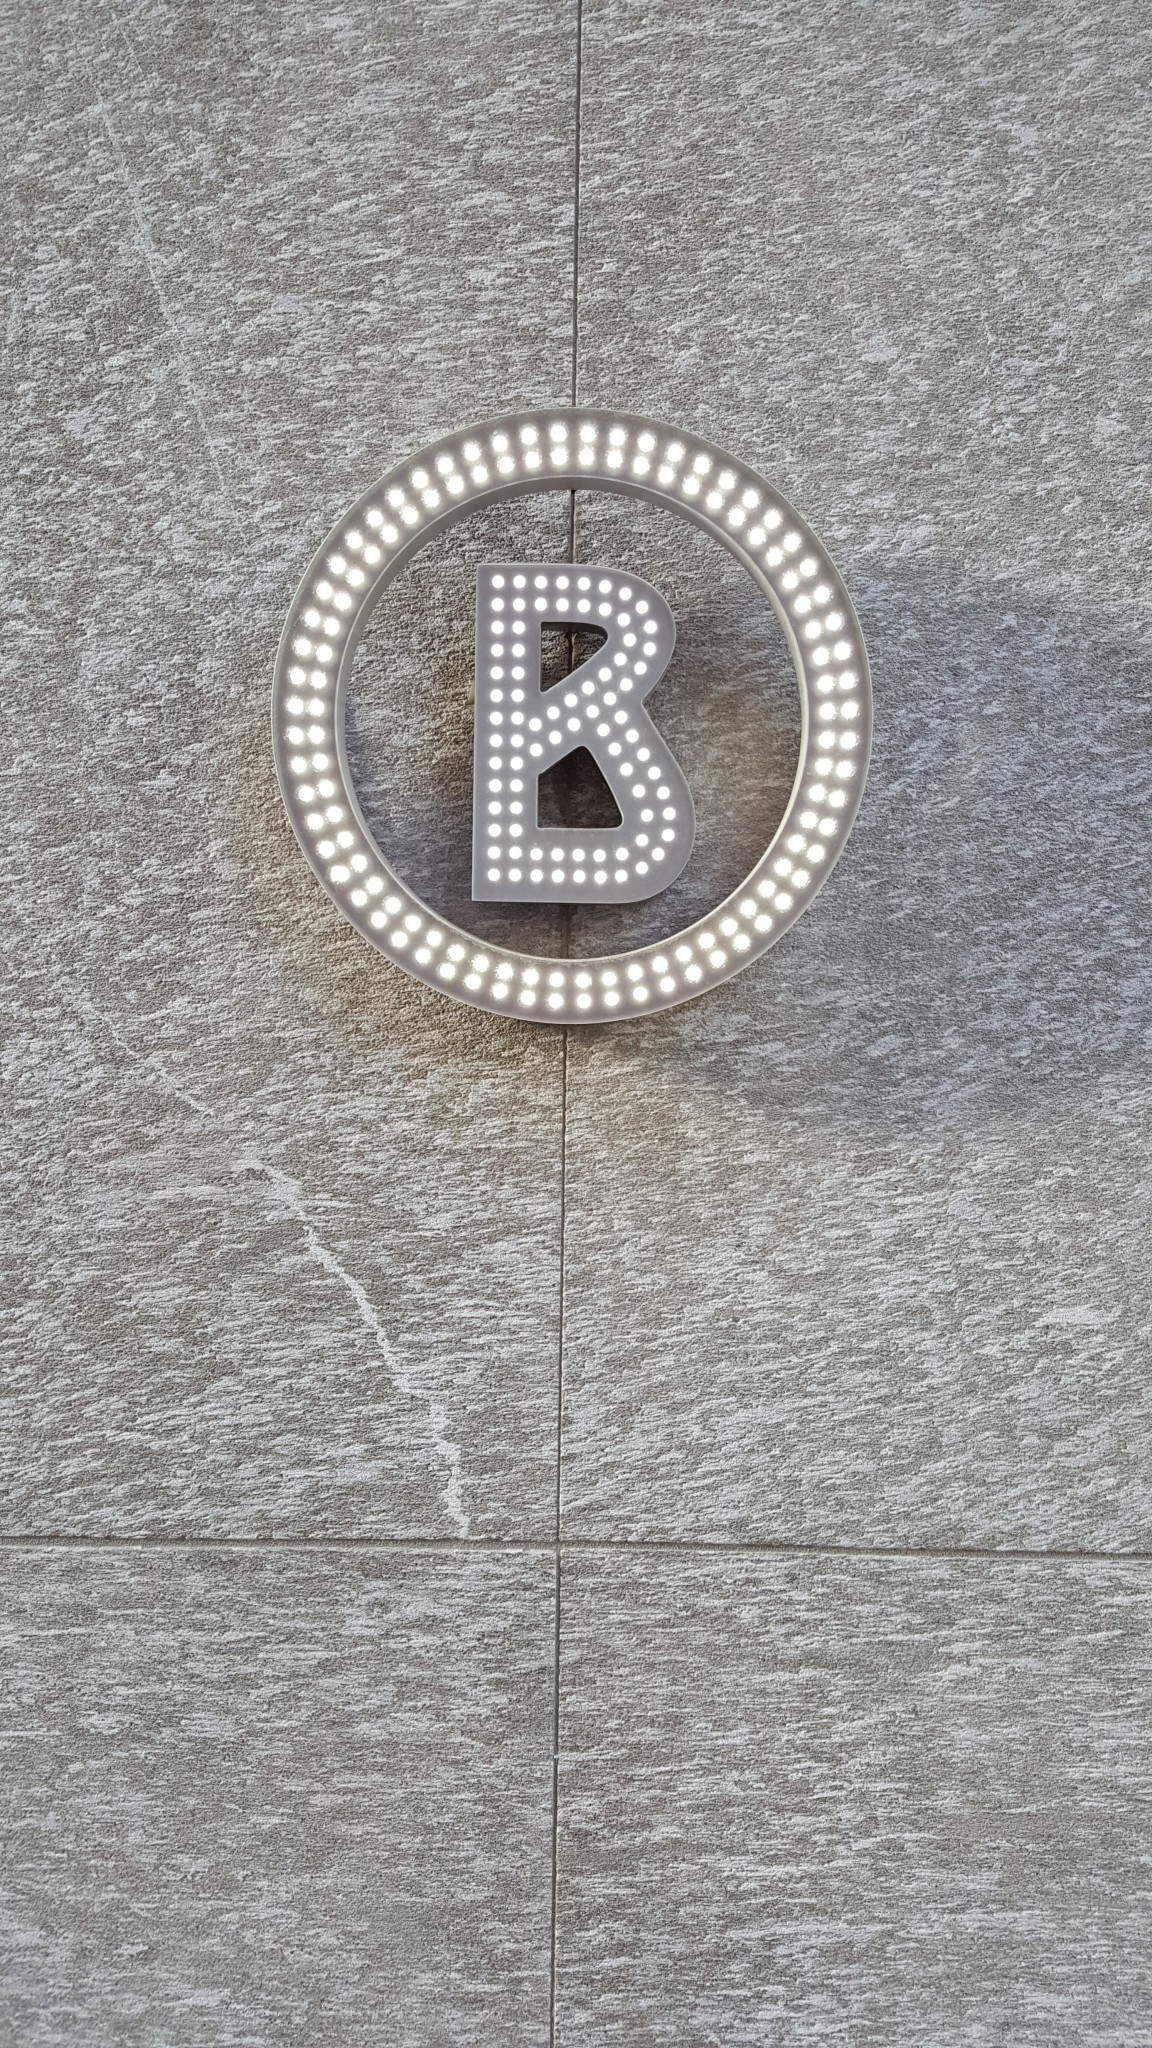 logo Negozio Bogner su parete in marmo- Saint Moritz